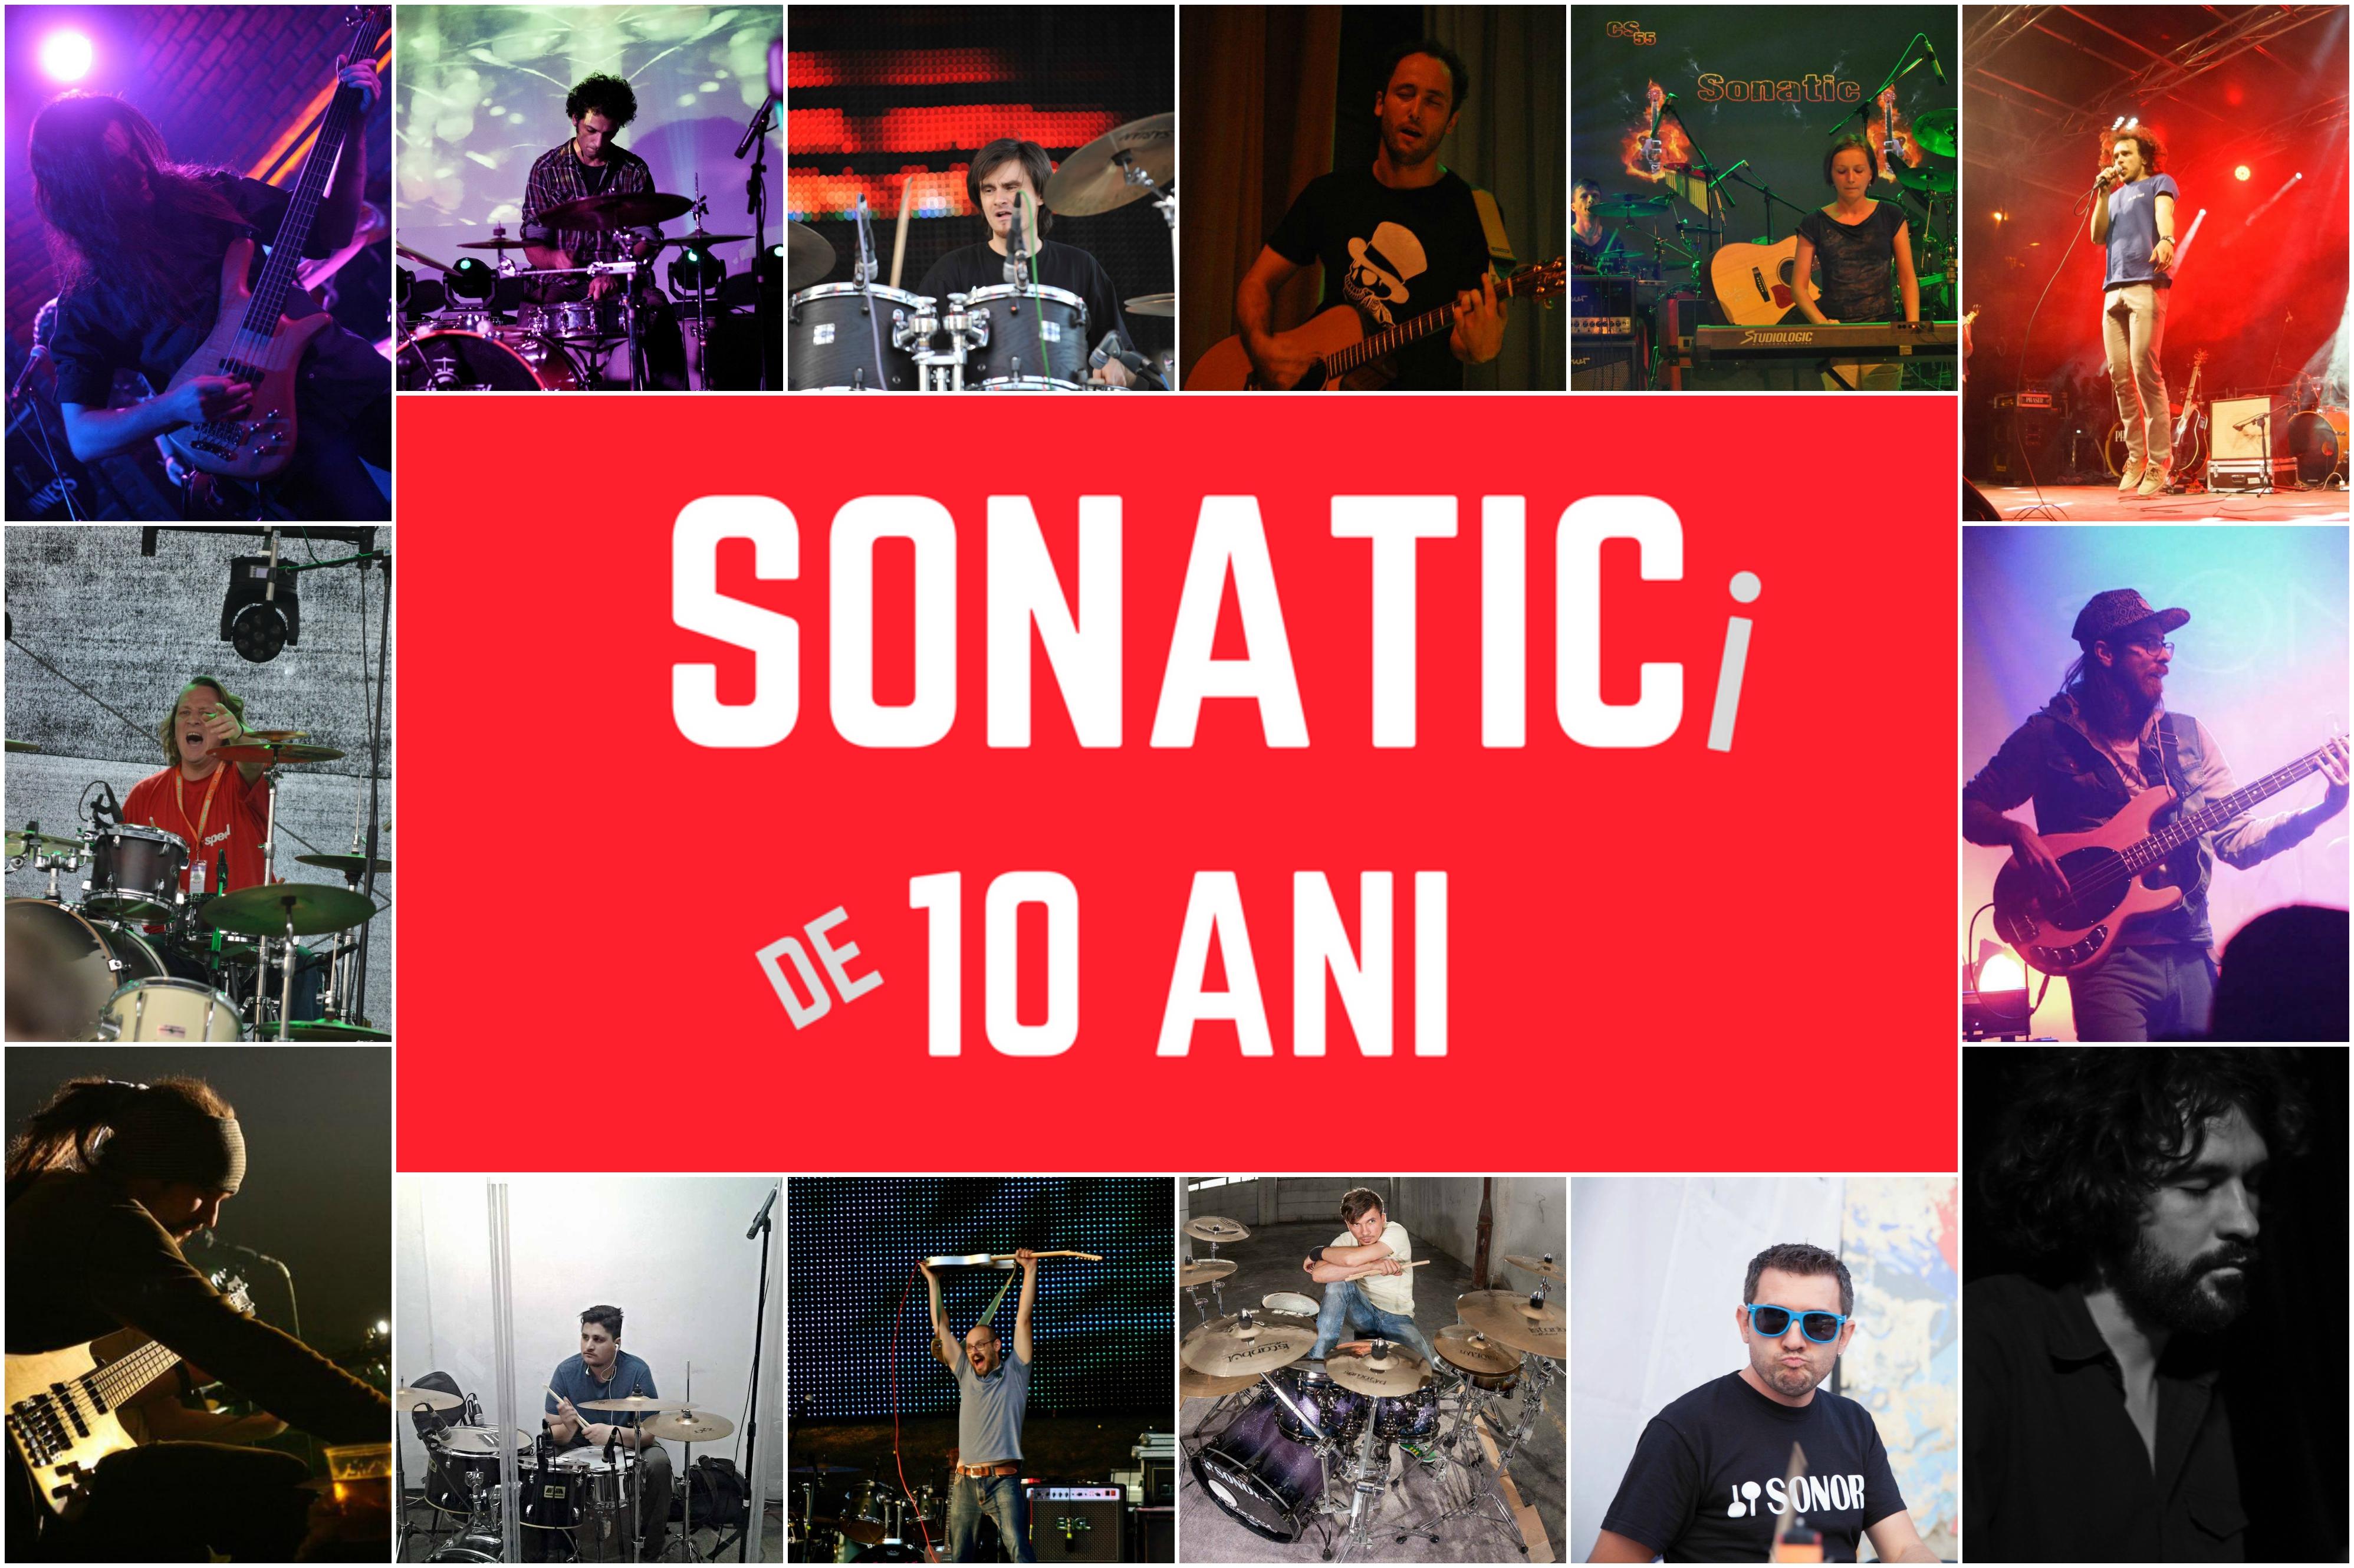 sonatic-10-ani